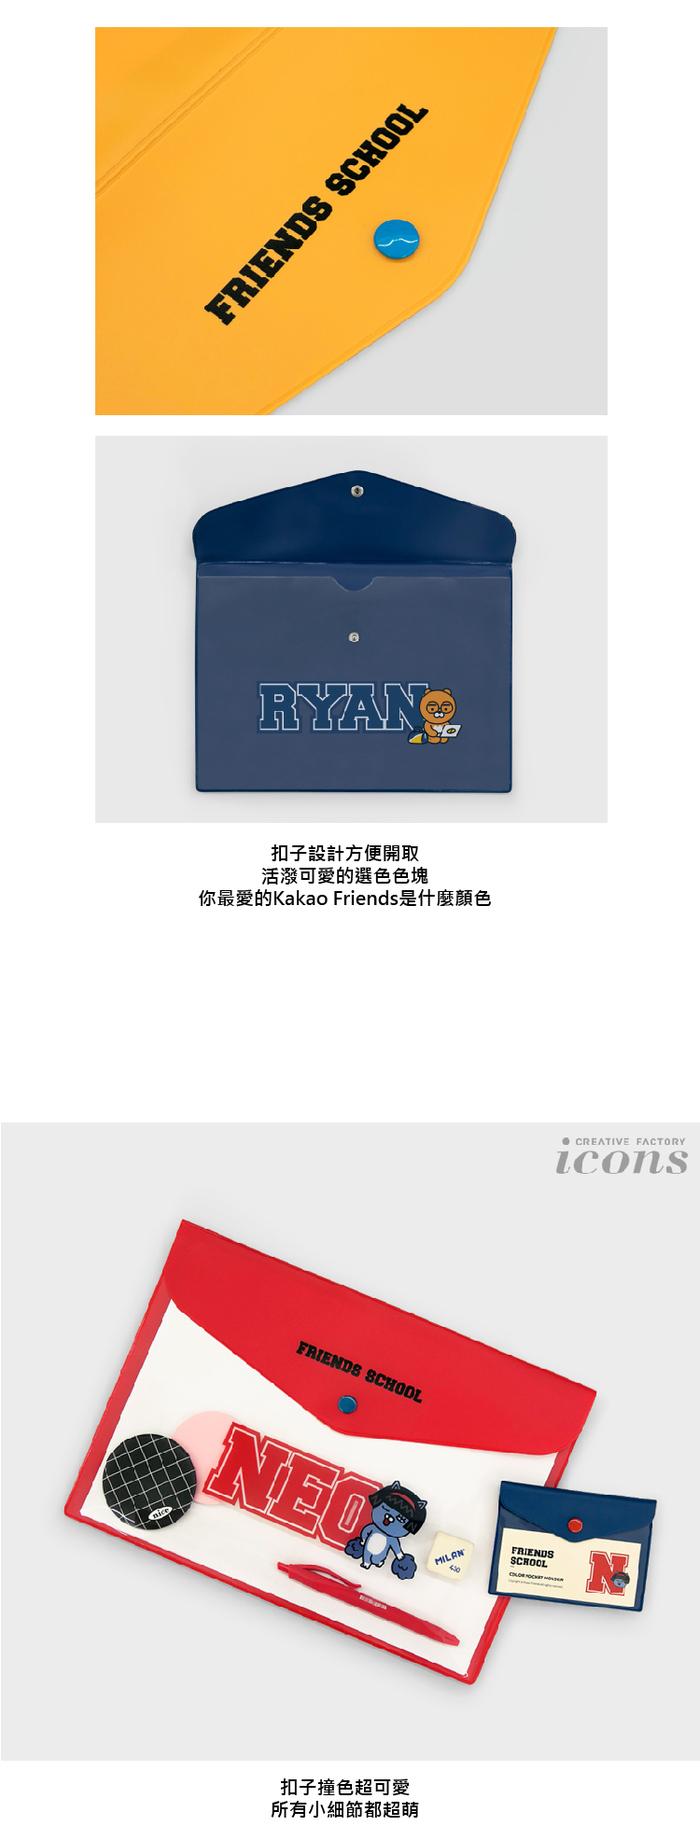 Kakao Friends|好朋友學院 文件資料萬用收納袋(L) RYAN